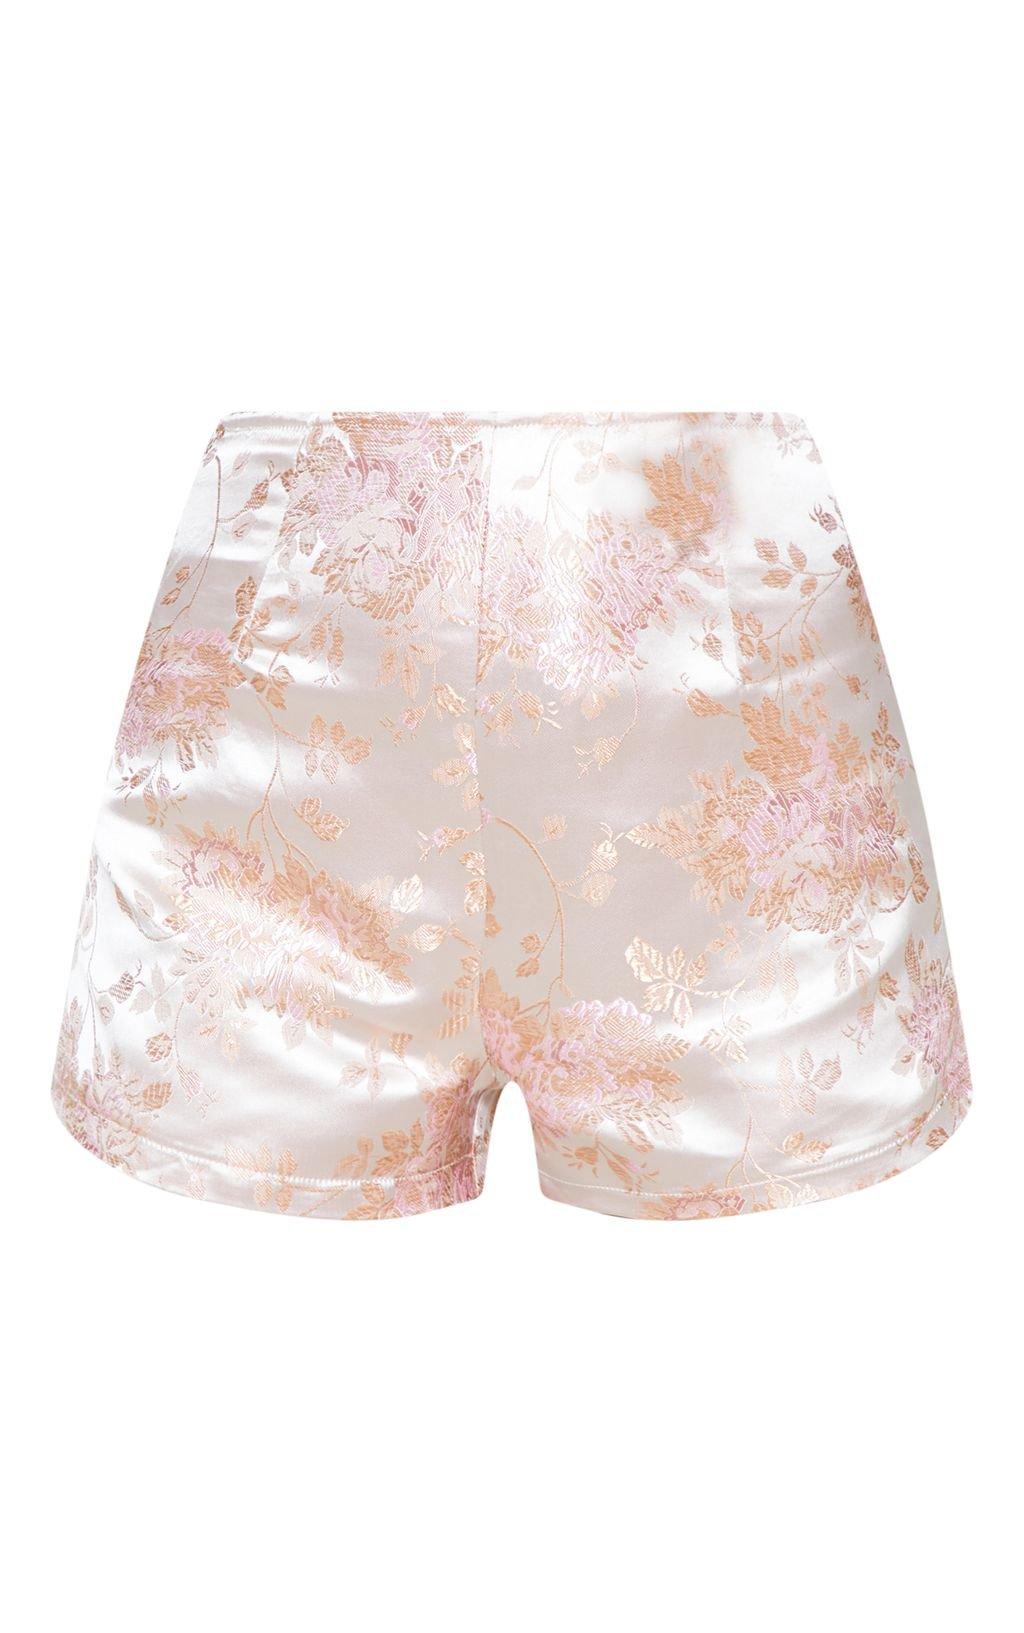 Blush Oriental Embroidered High Short | PrettyLittleThing USA